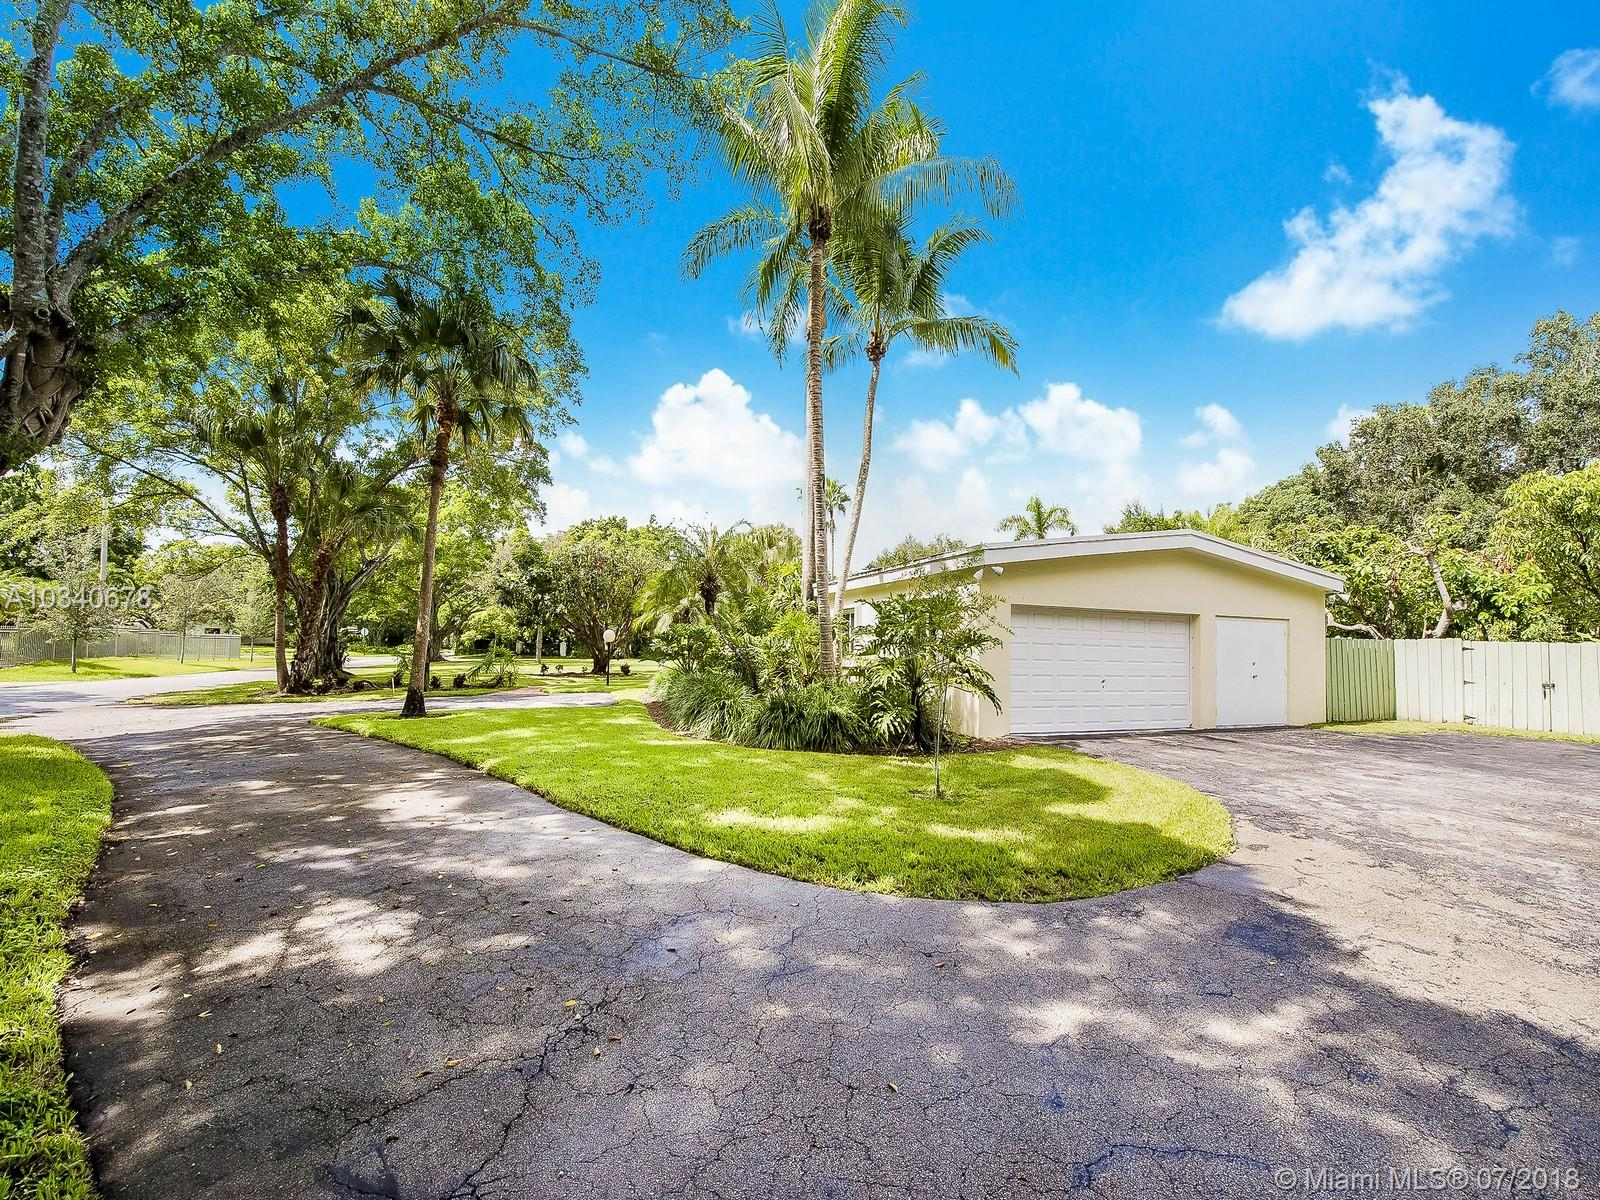 11400 Sw 68th Ct, Pinecrest FL, 33156